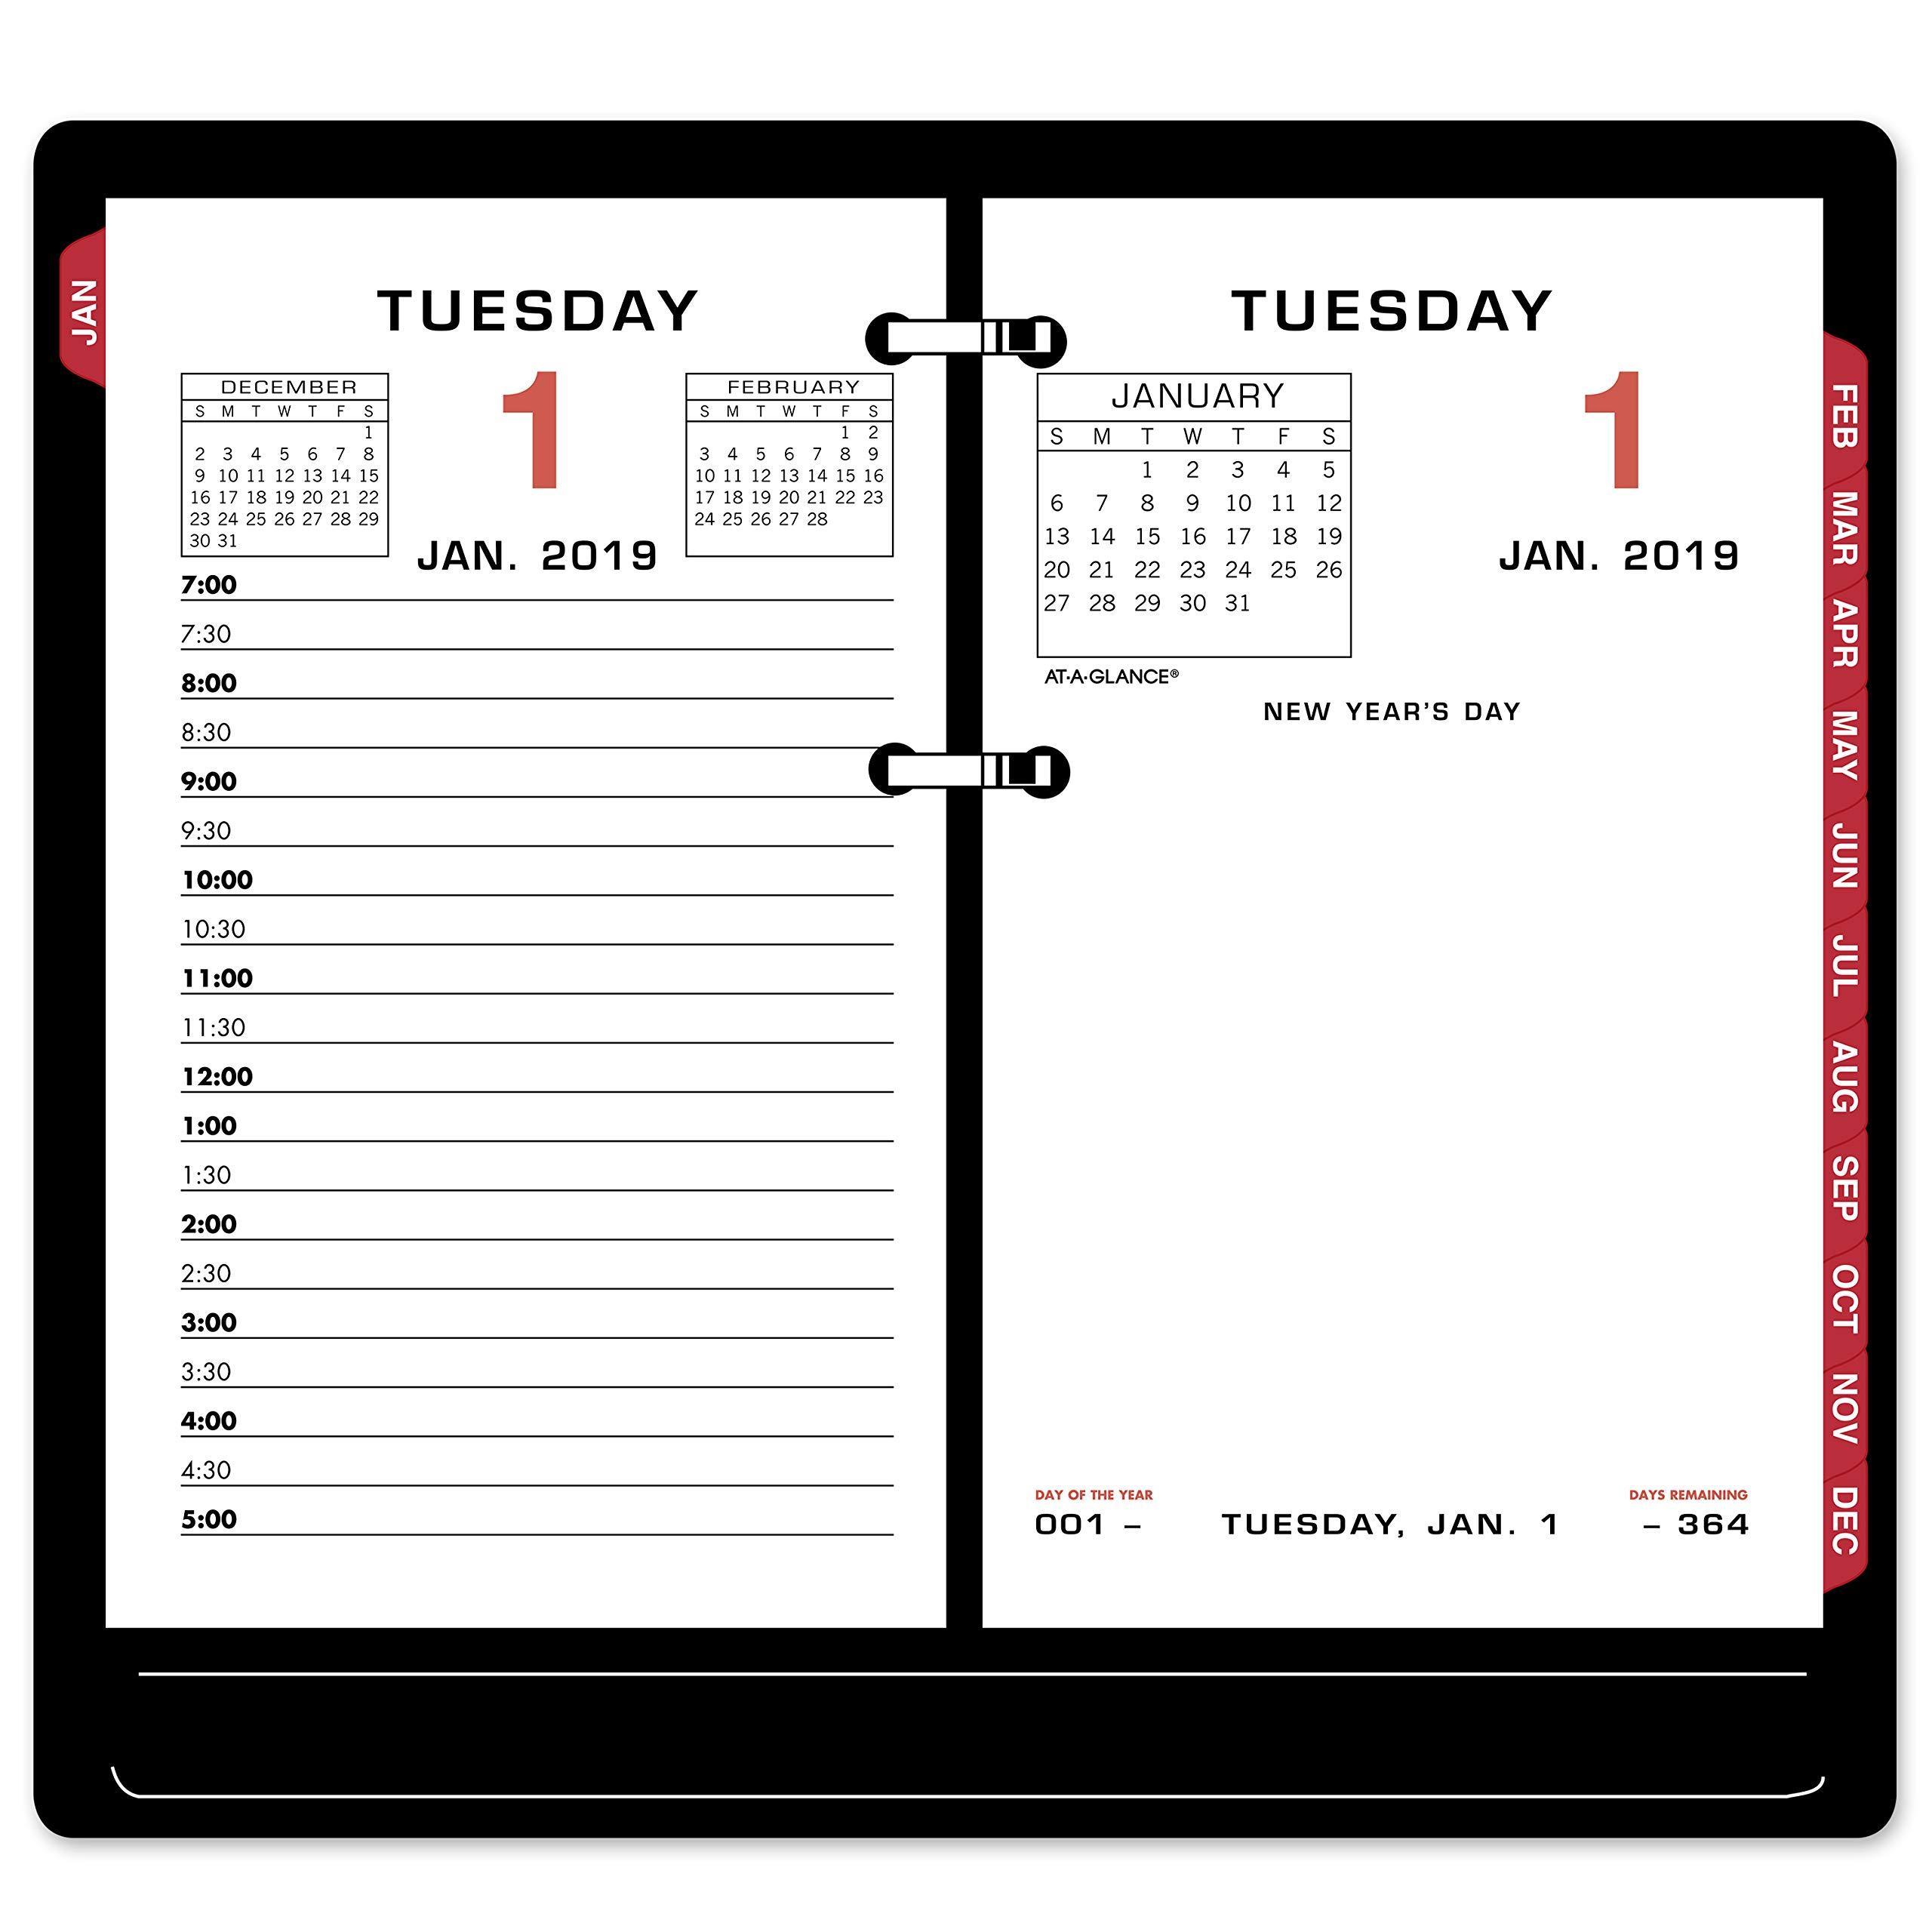 AT-A-GLANCE 2019 Daily Desk Calendar Refill, 3-1/2'' x 6'', Loose Leaf (E01750)